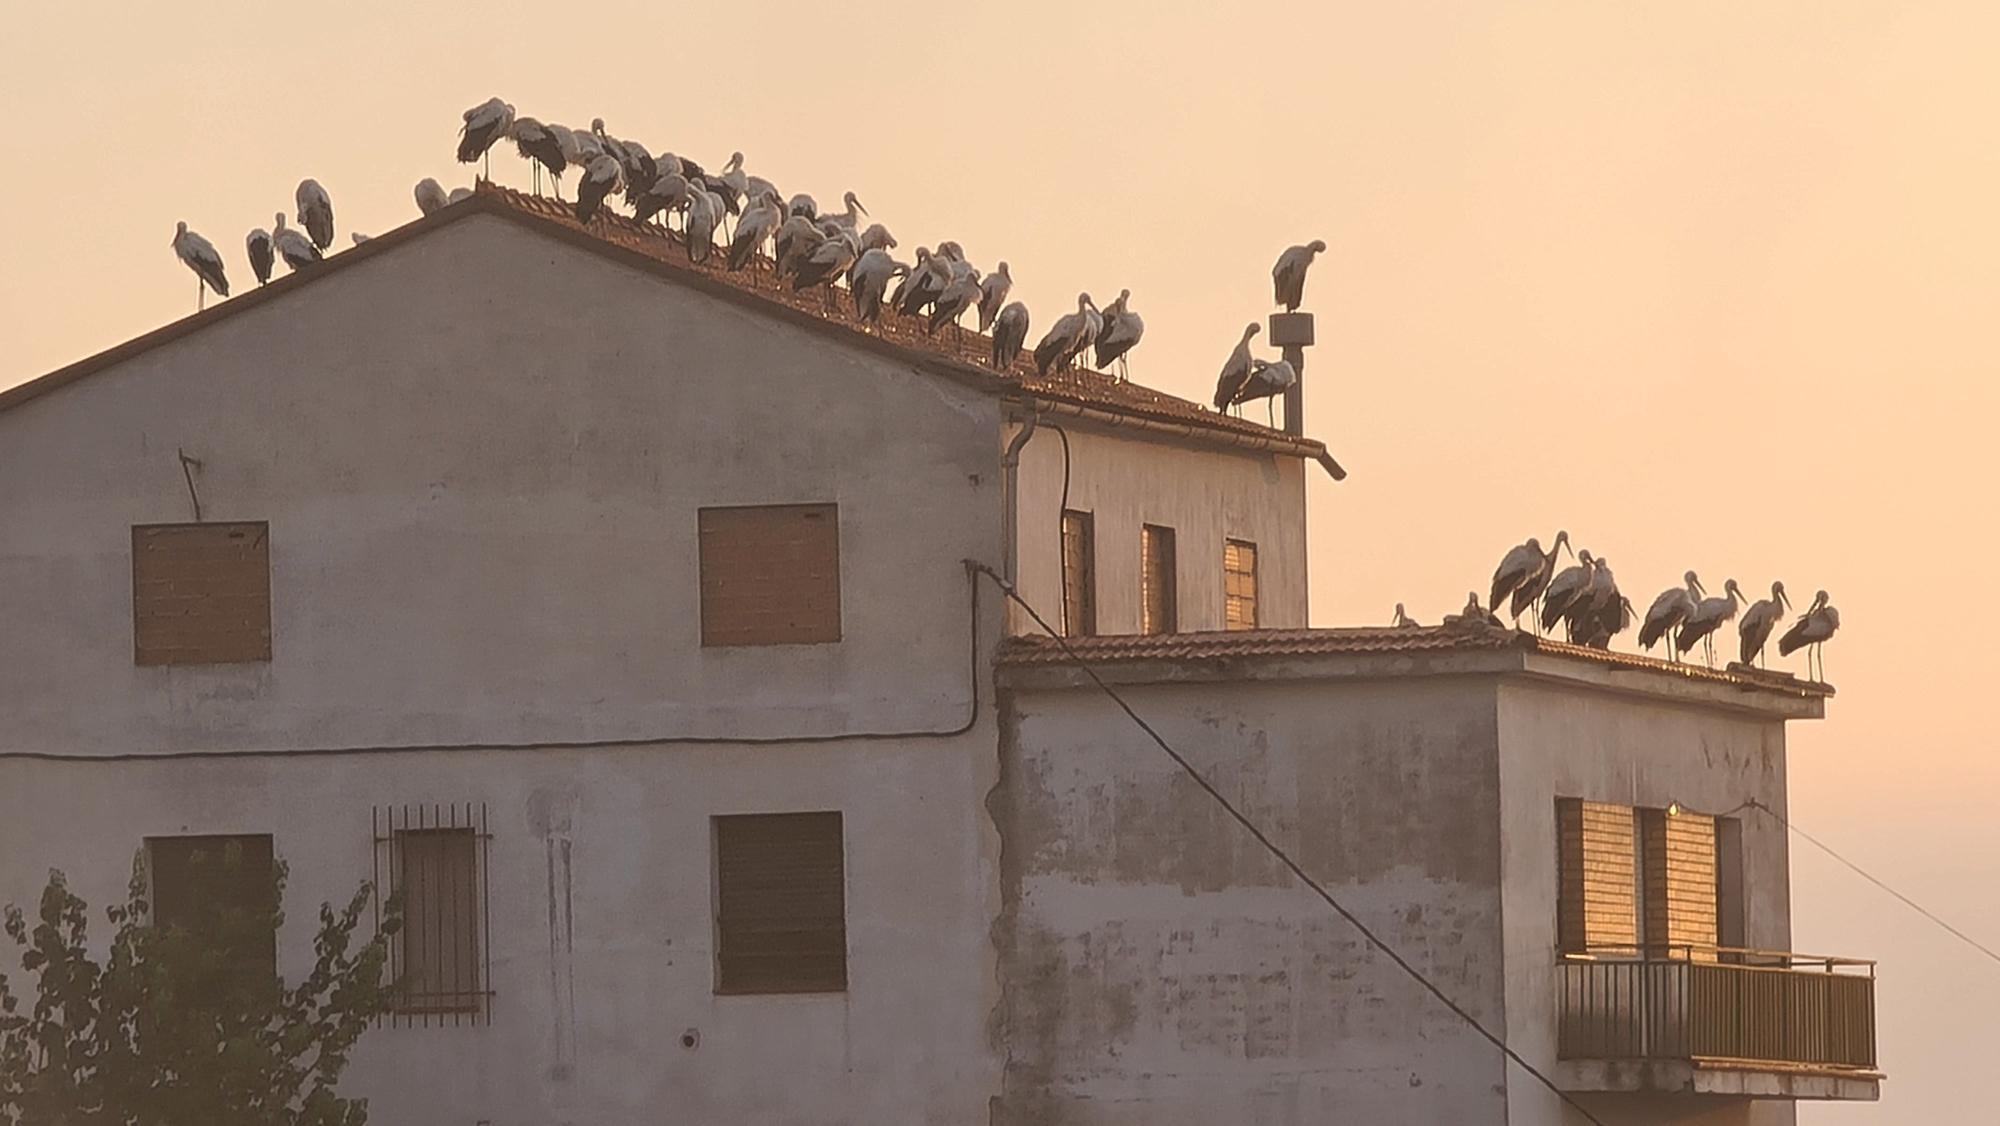 Desenes de cigonyes fan nit a Cardona